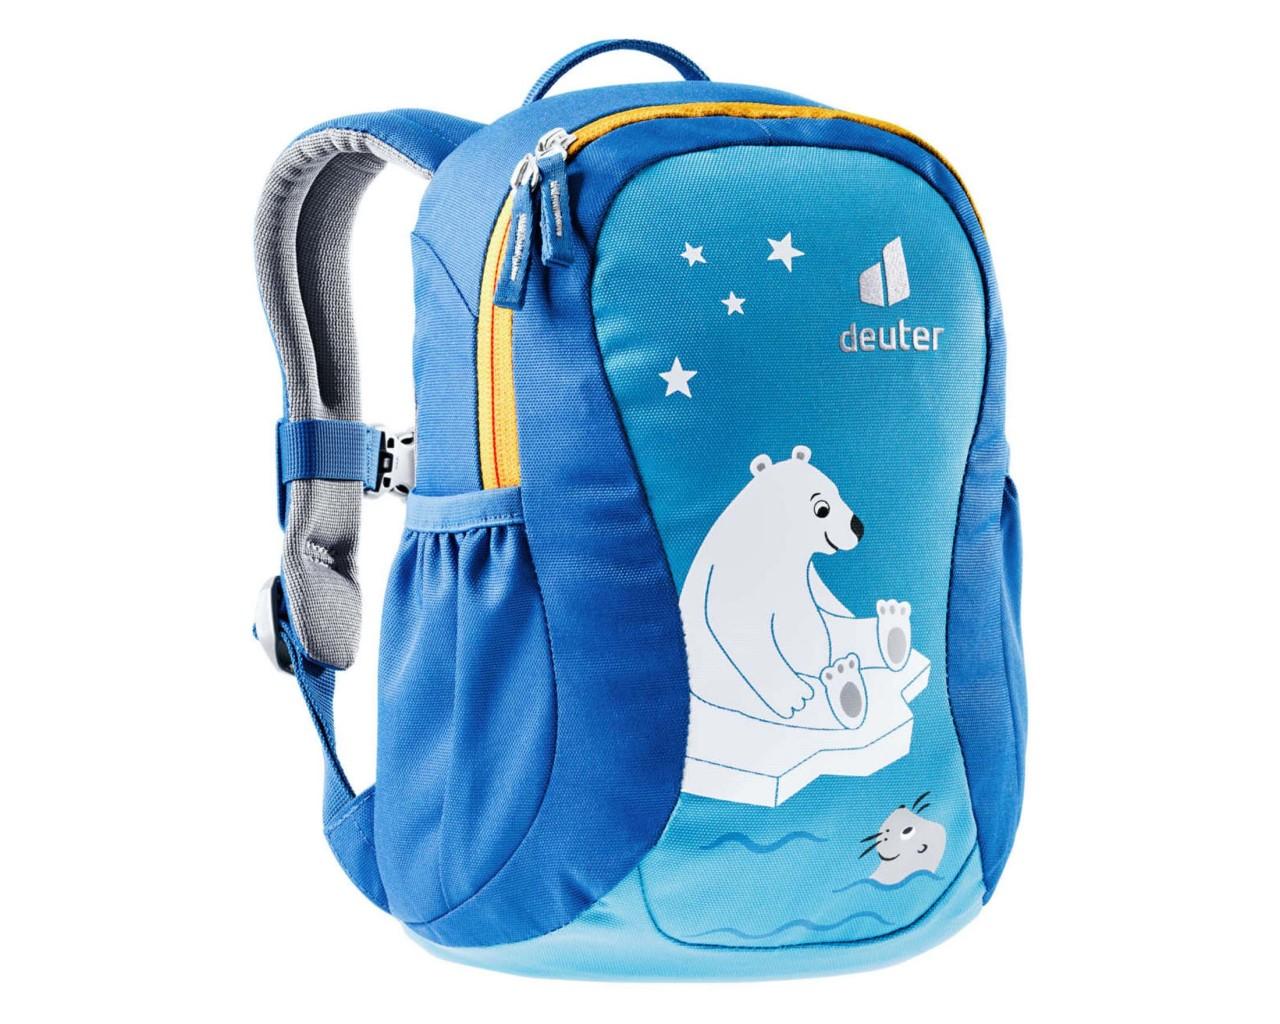 Deuter Pico 5 litres Kids Backpack PFC-free | azure-lapsis